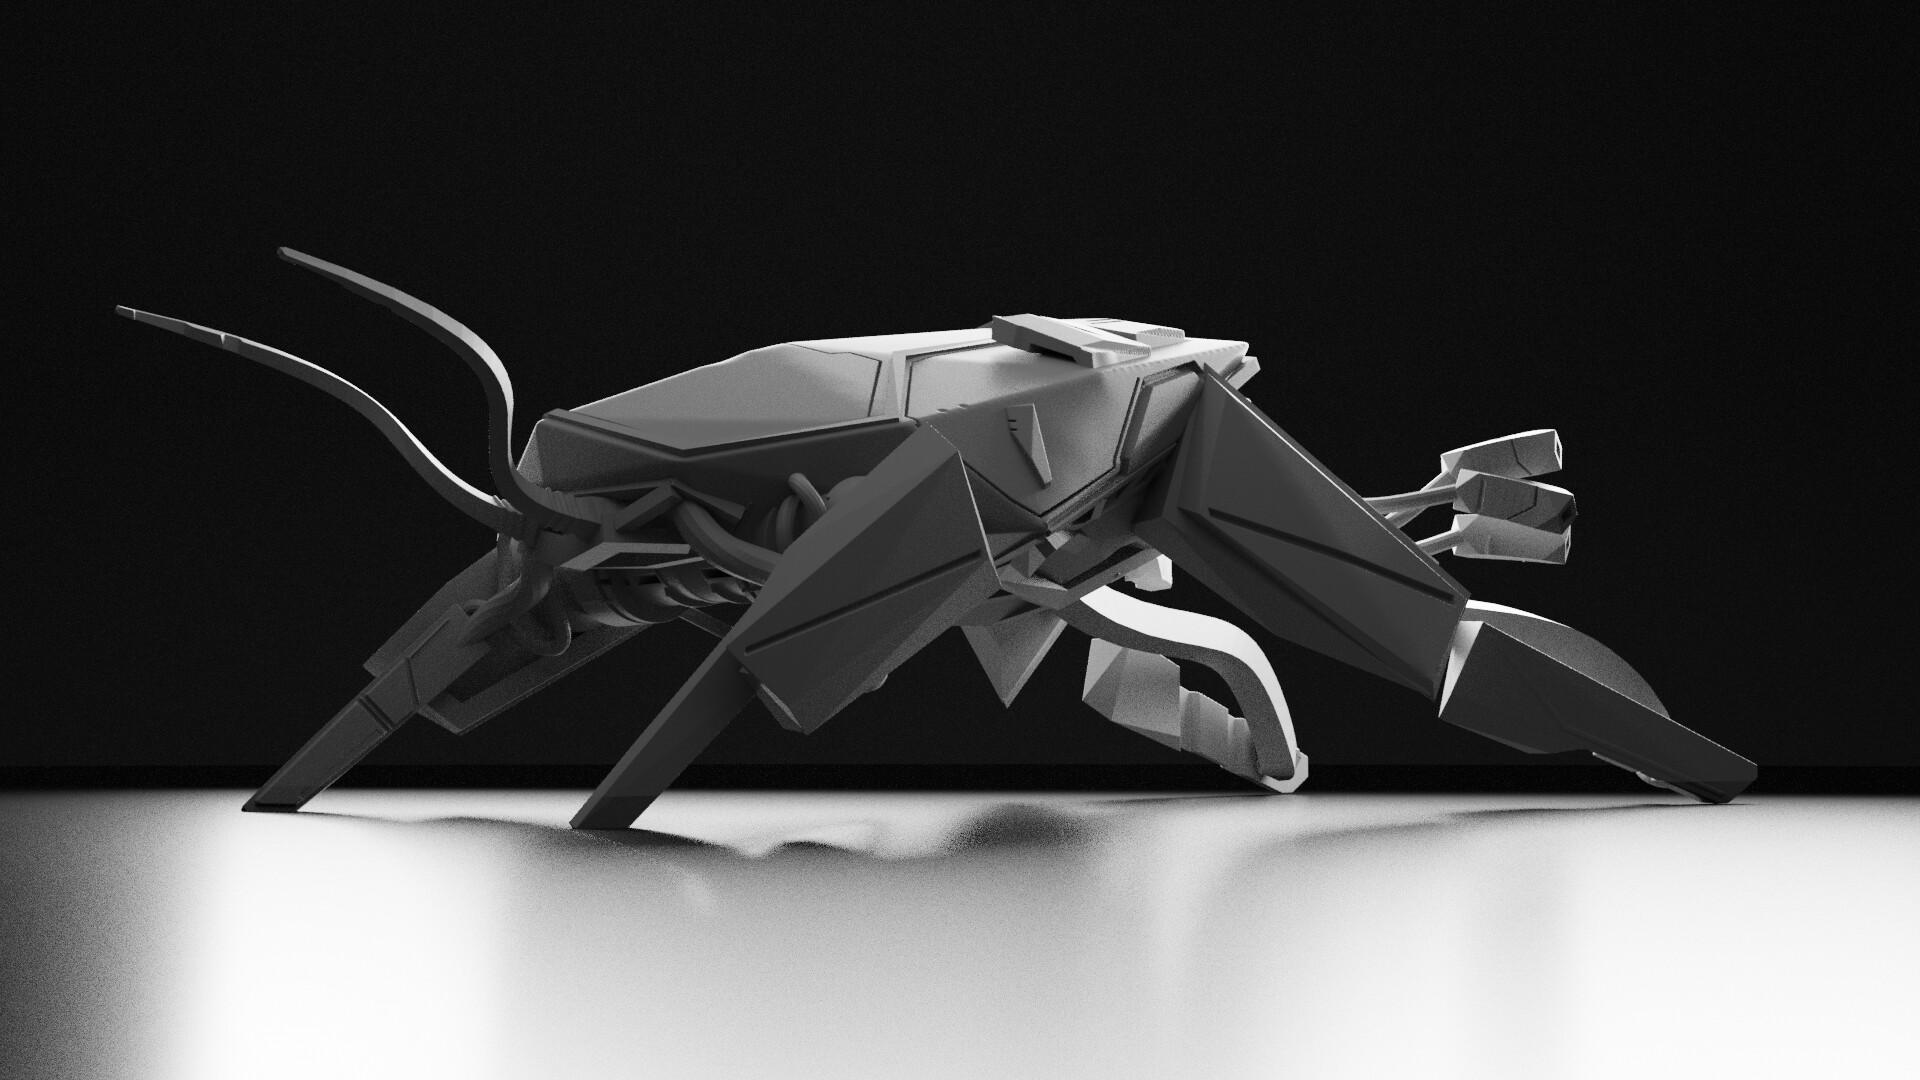 Diamondback   Fabric manipulation, Origami paper art, Origami paper   1080x1920